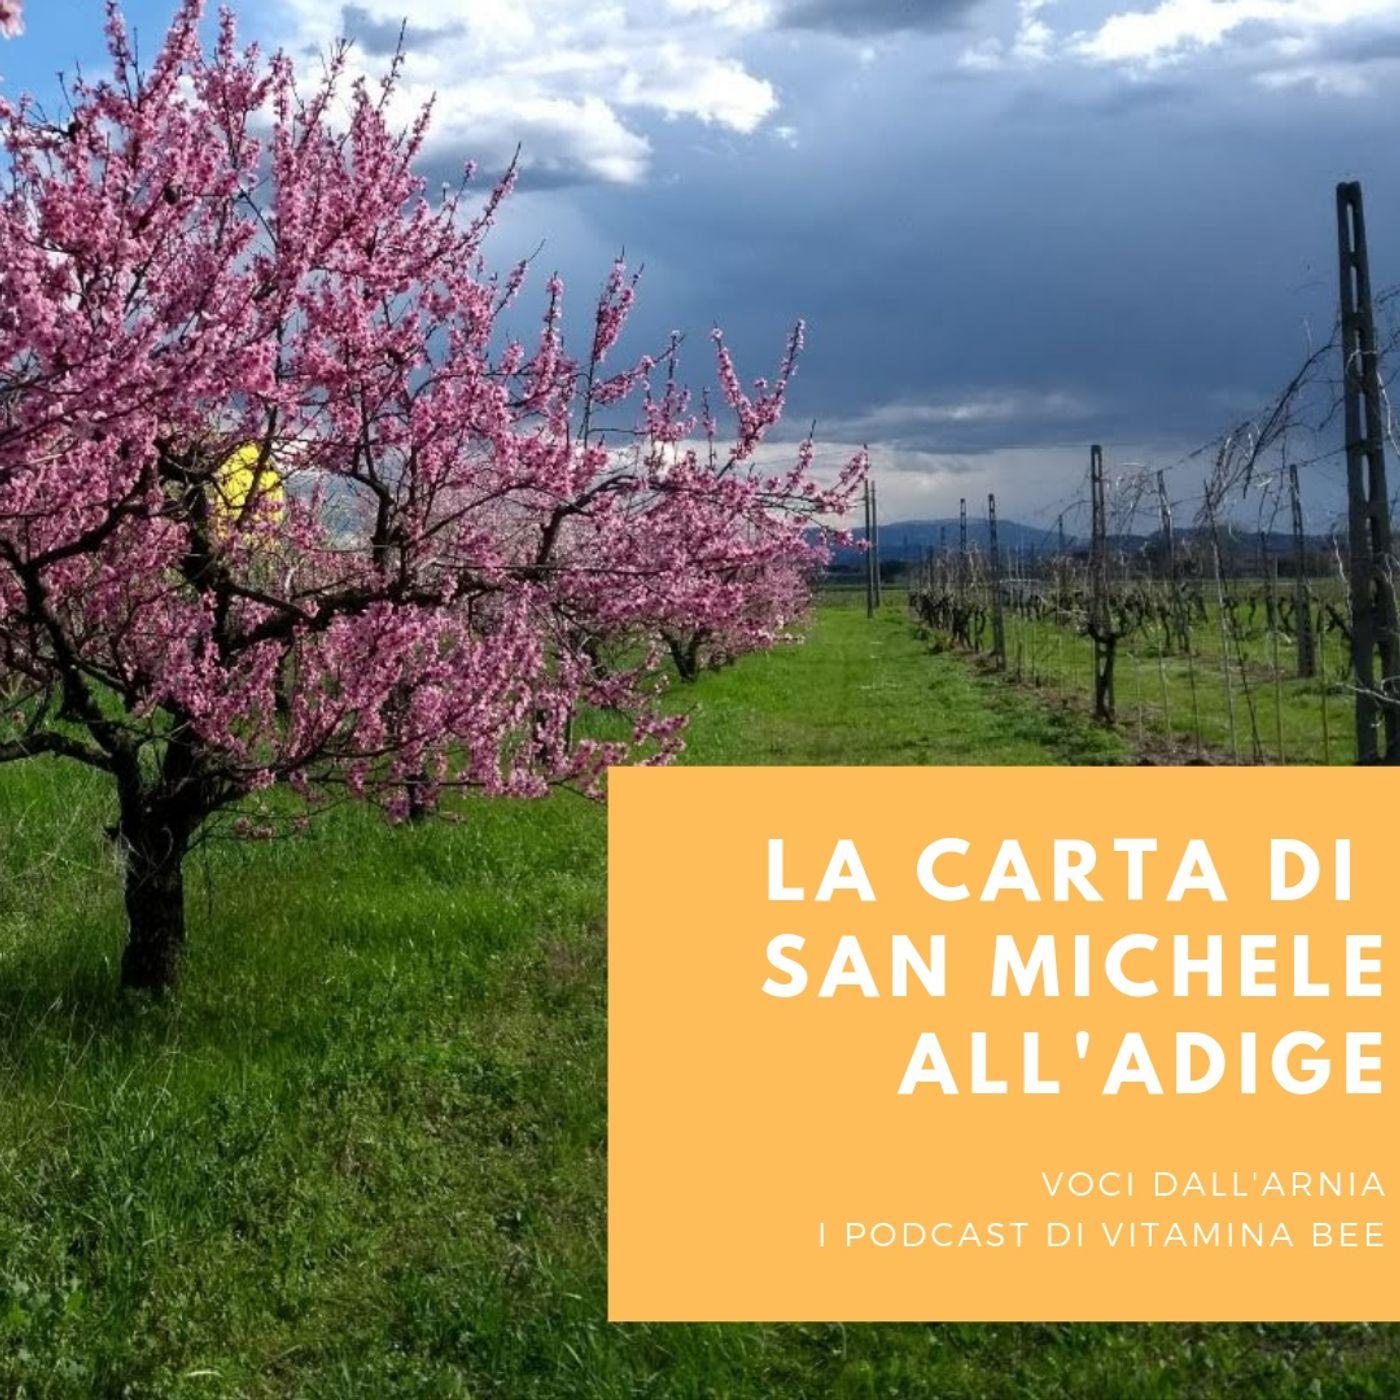 La Carta di San Michele all'Adige